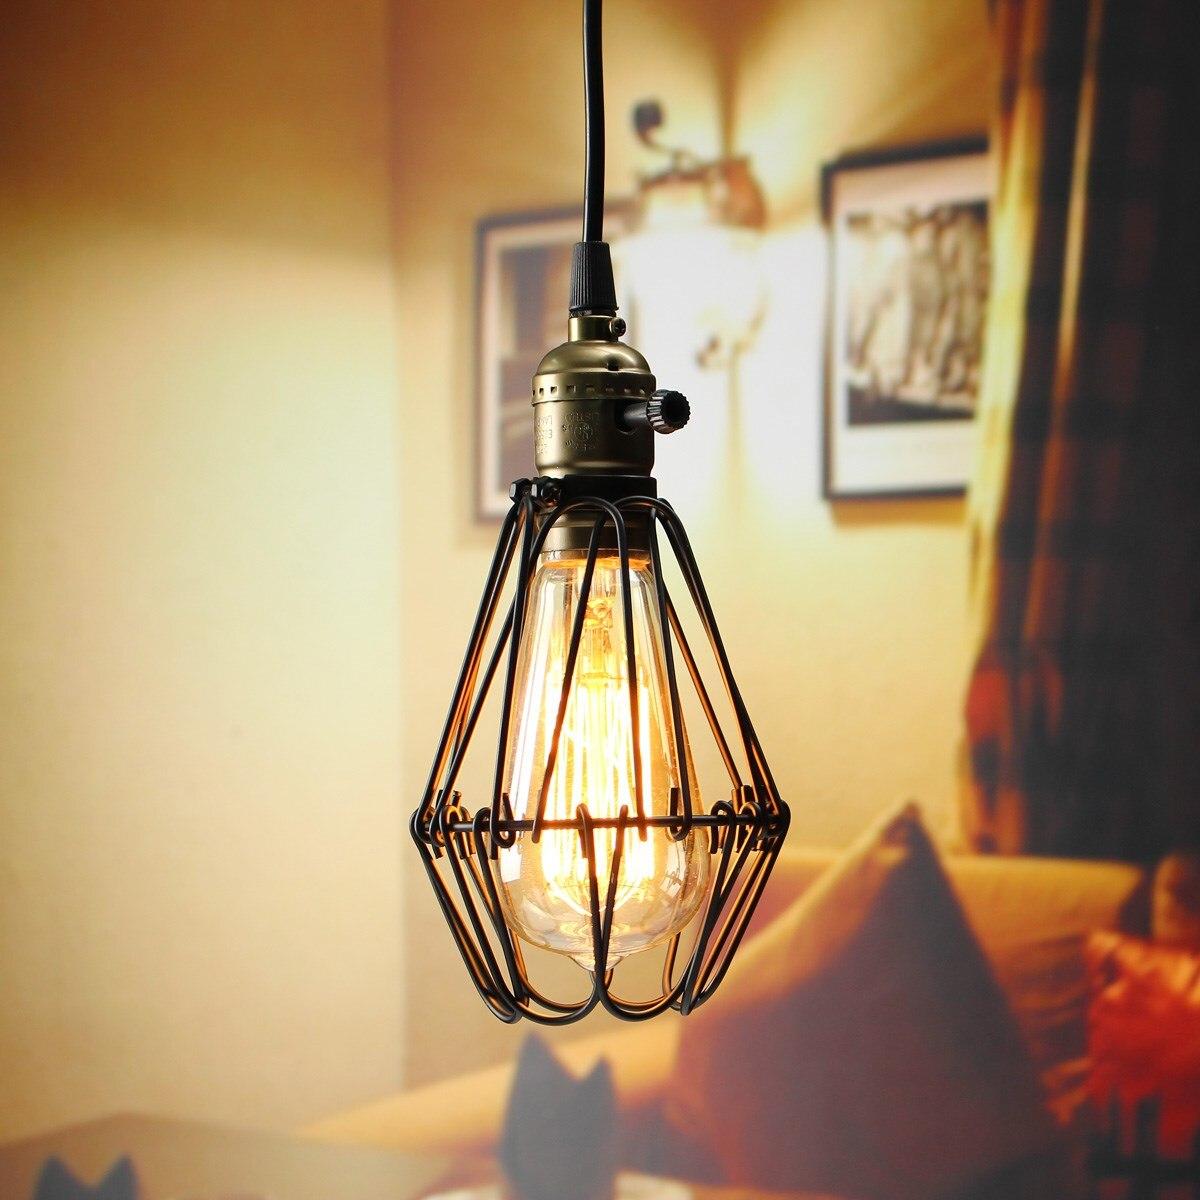 Details about e27 type plug in hanging pendant light fixture lamp bulb - Hot Sale E27 40w St64 Loft Metal Retro Industrial Pendant Light Black Wall Hanging Lamp Shade